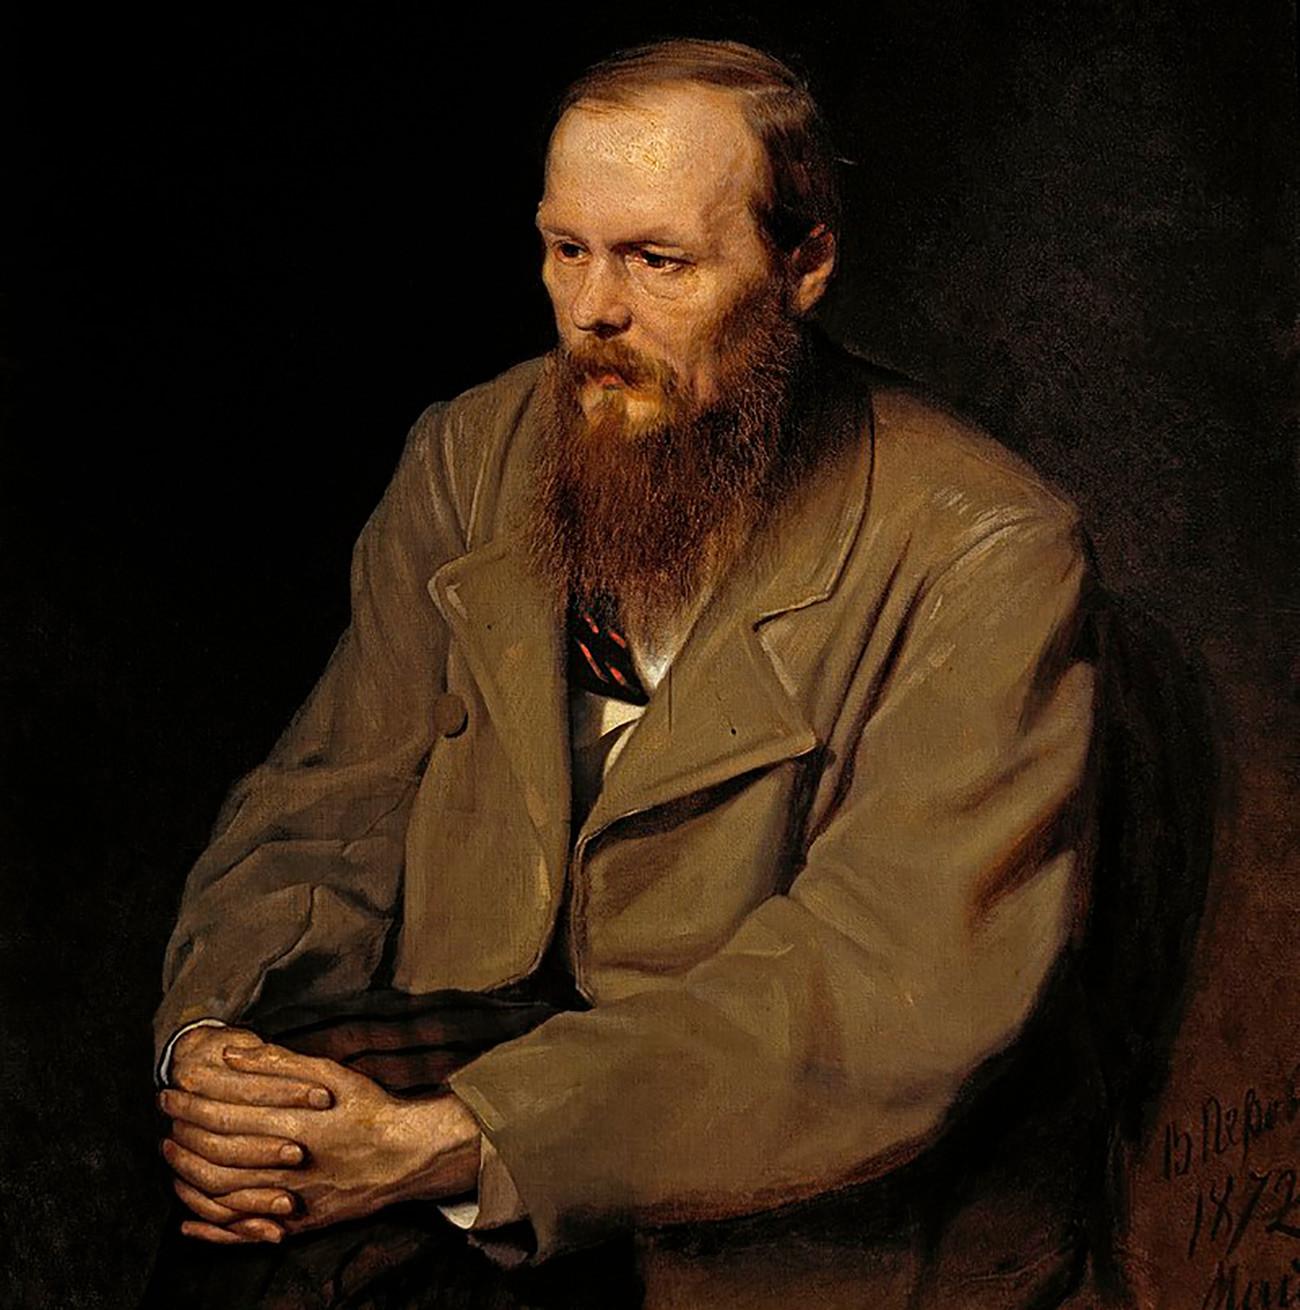 Porträt von Fjodor Dostojewski